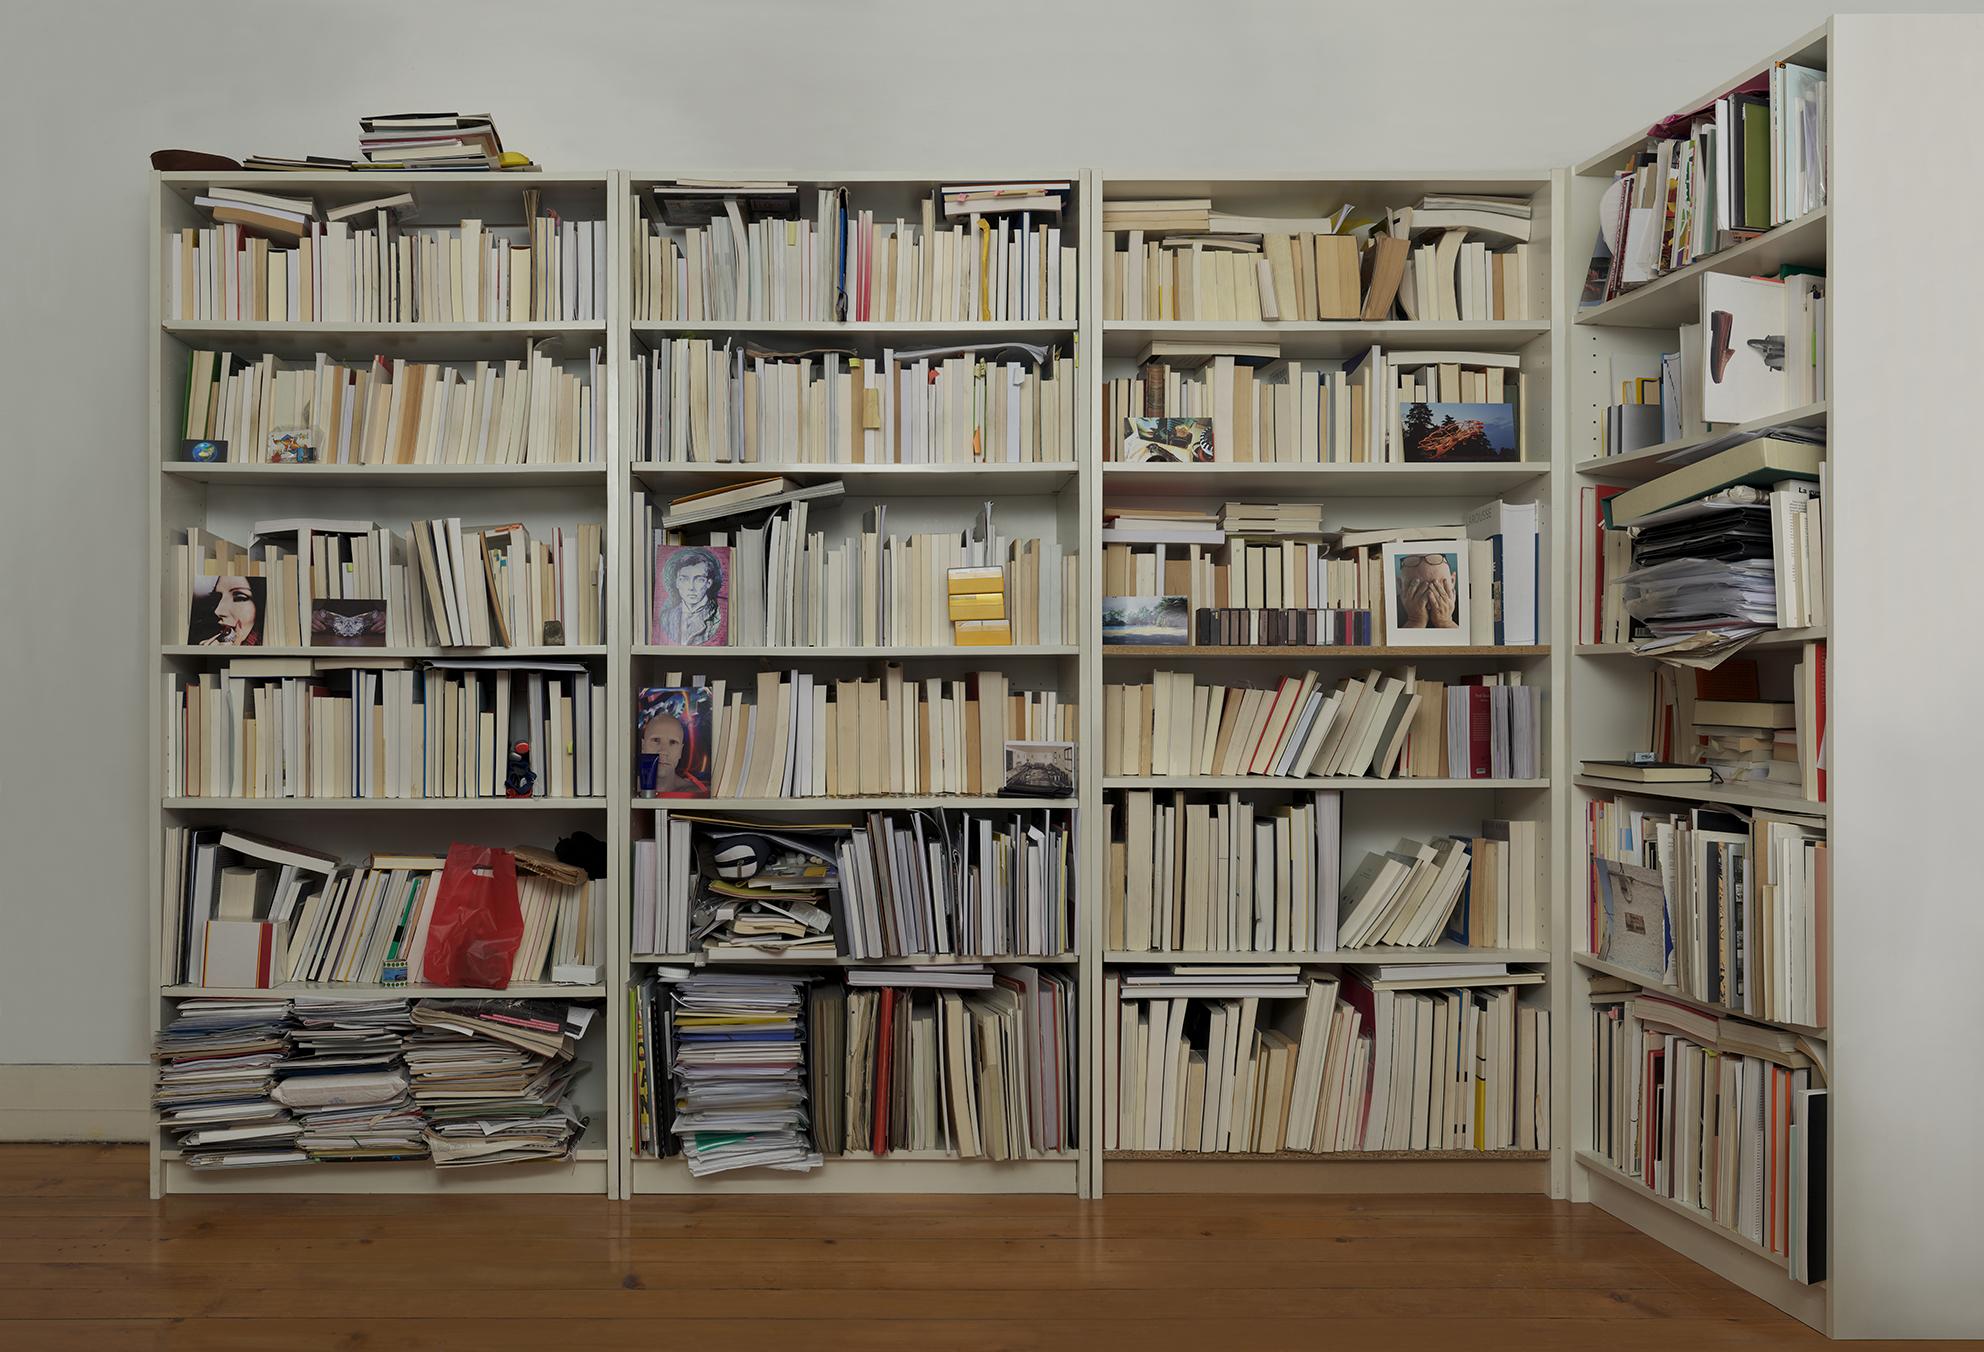 Bookshelf 2, Joerg Bader, critique, Genève